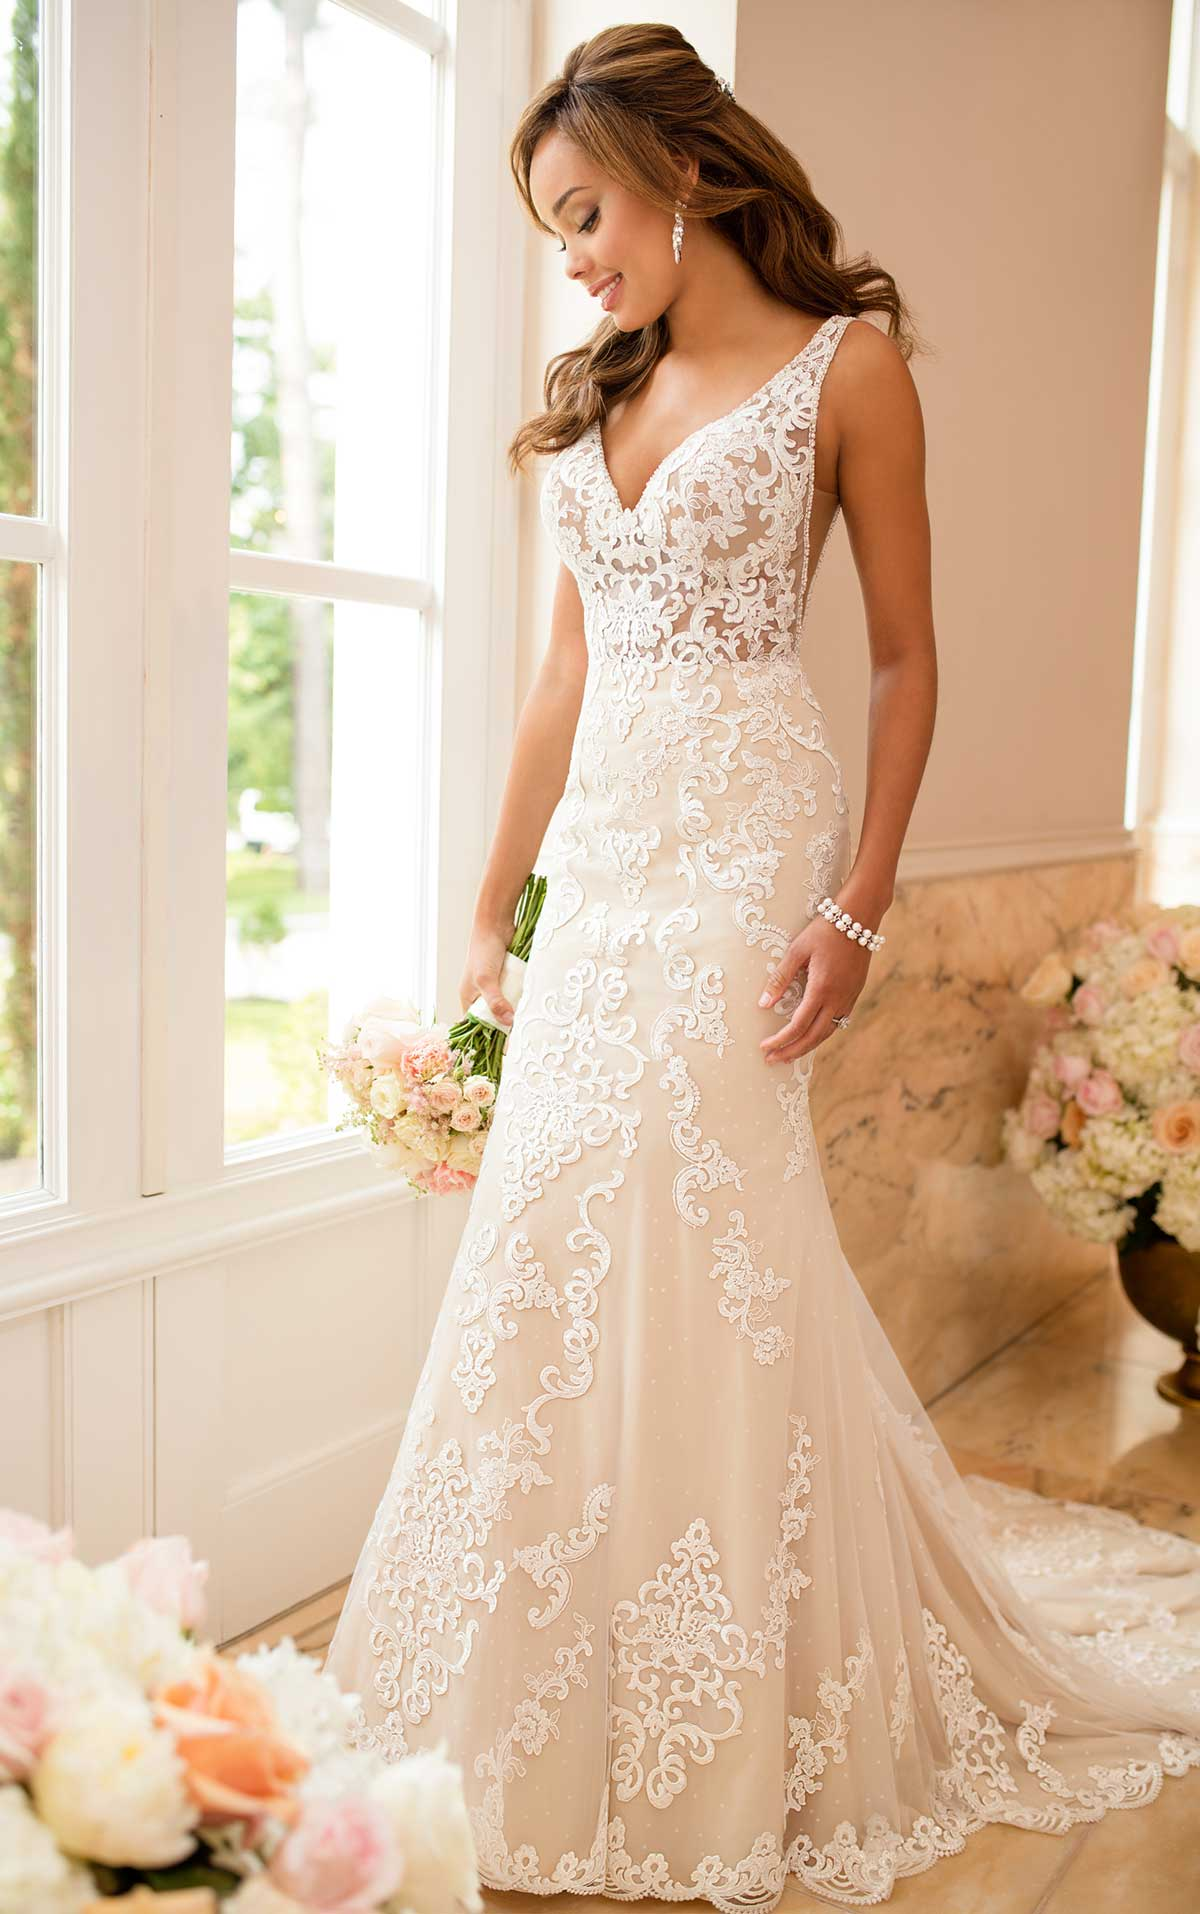 simple wedding dresses for beach wedding photo - 1